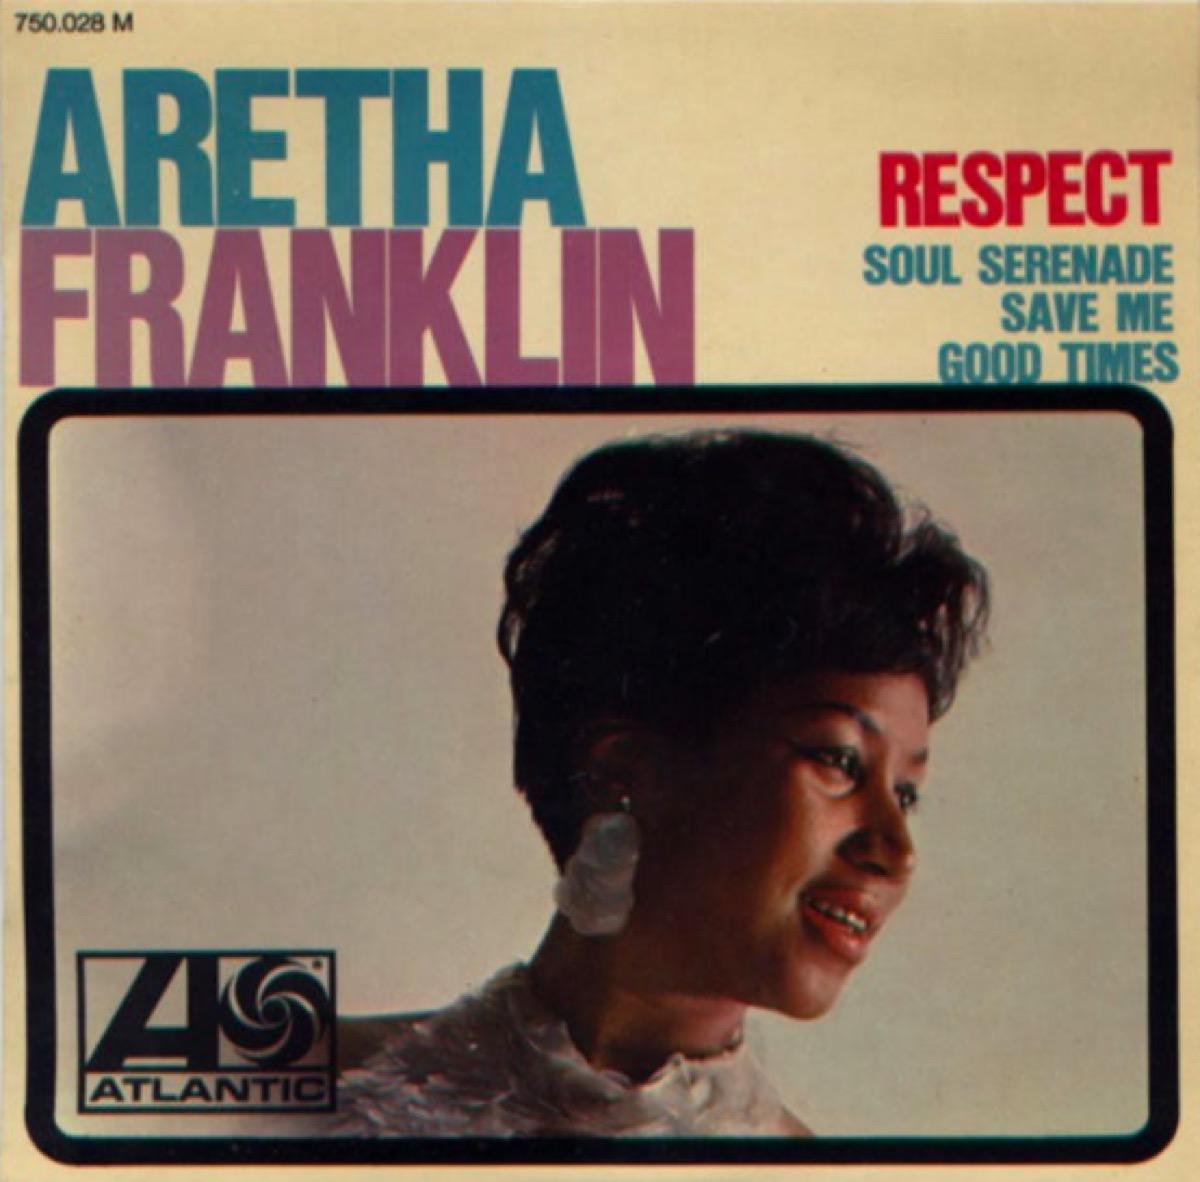 Respect song